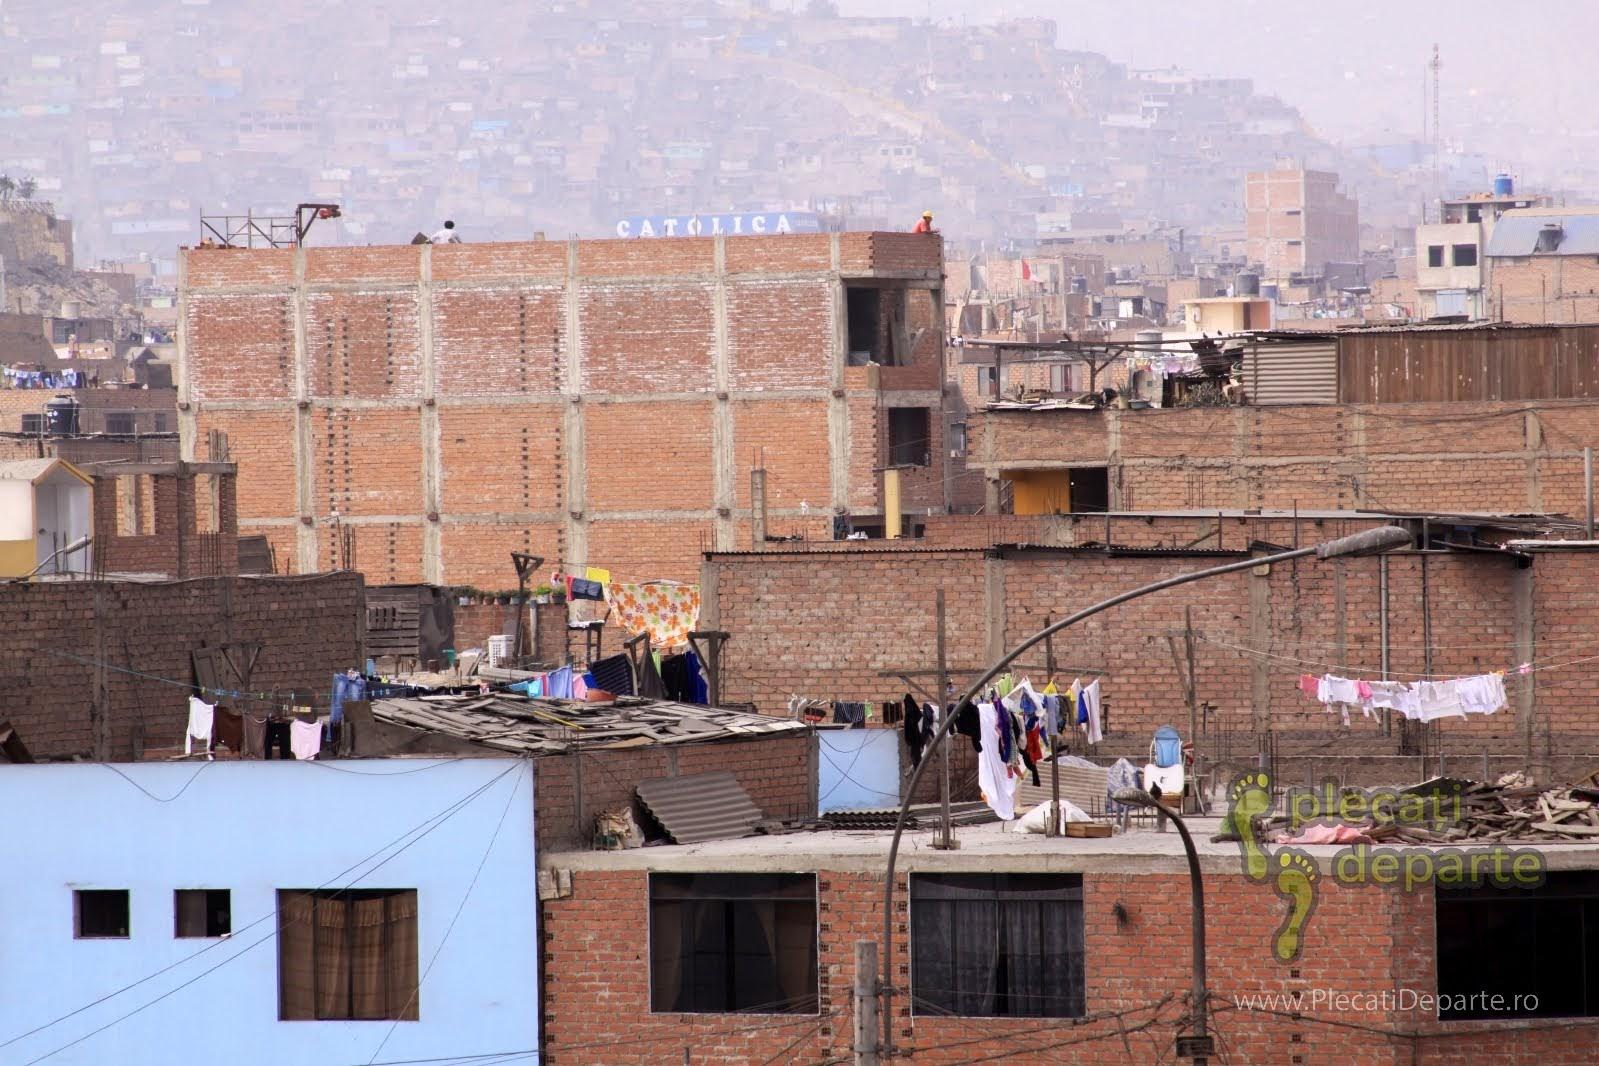 locuinte neterminate in cartierul San Juan de Lurigancho, Lima, Peru